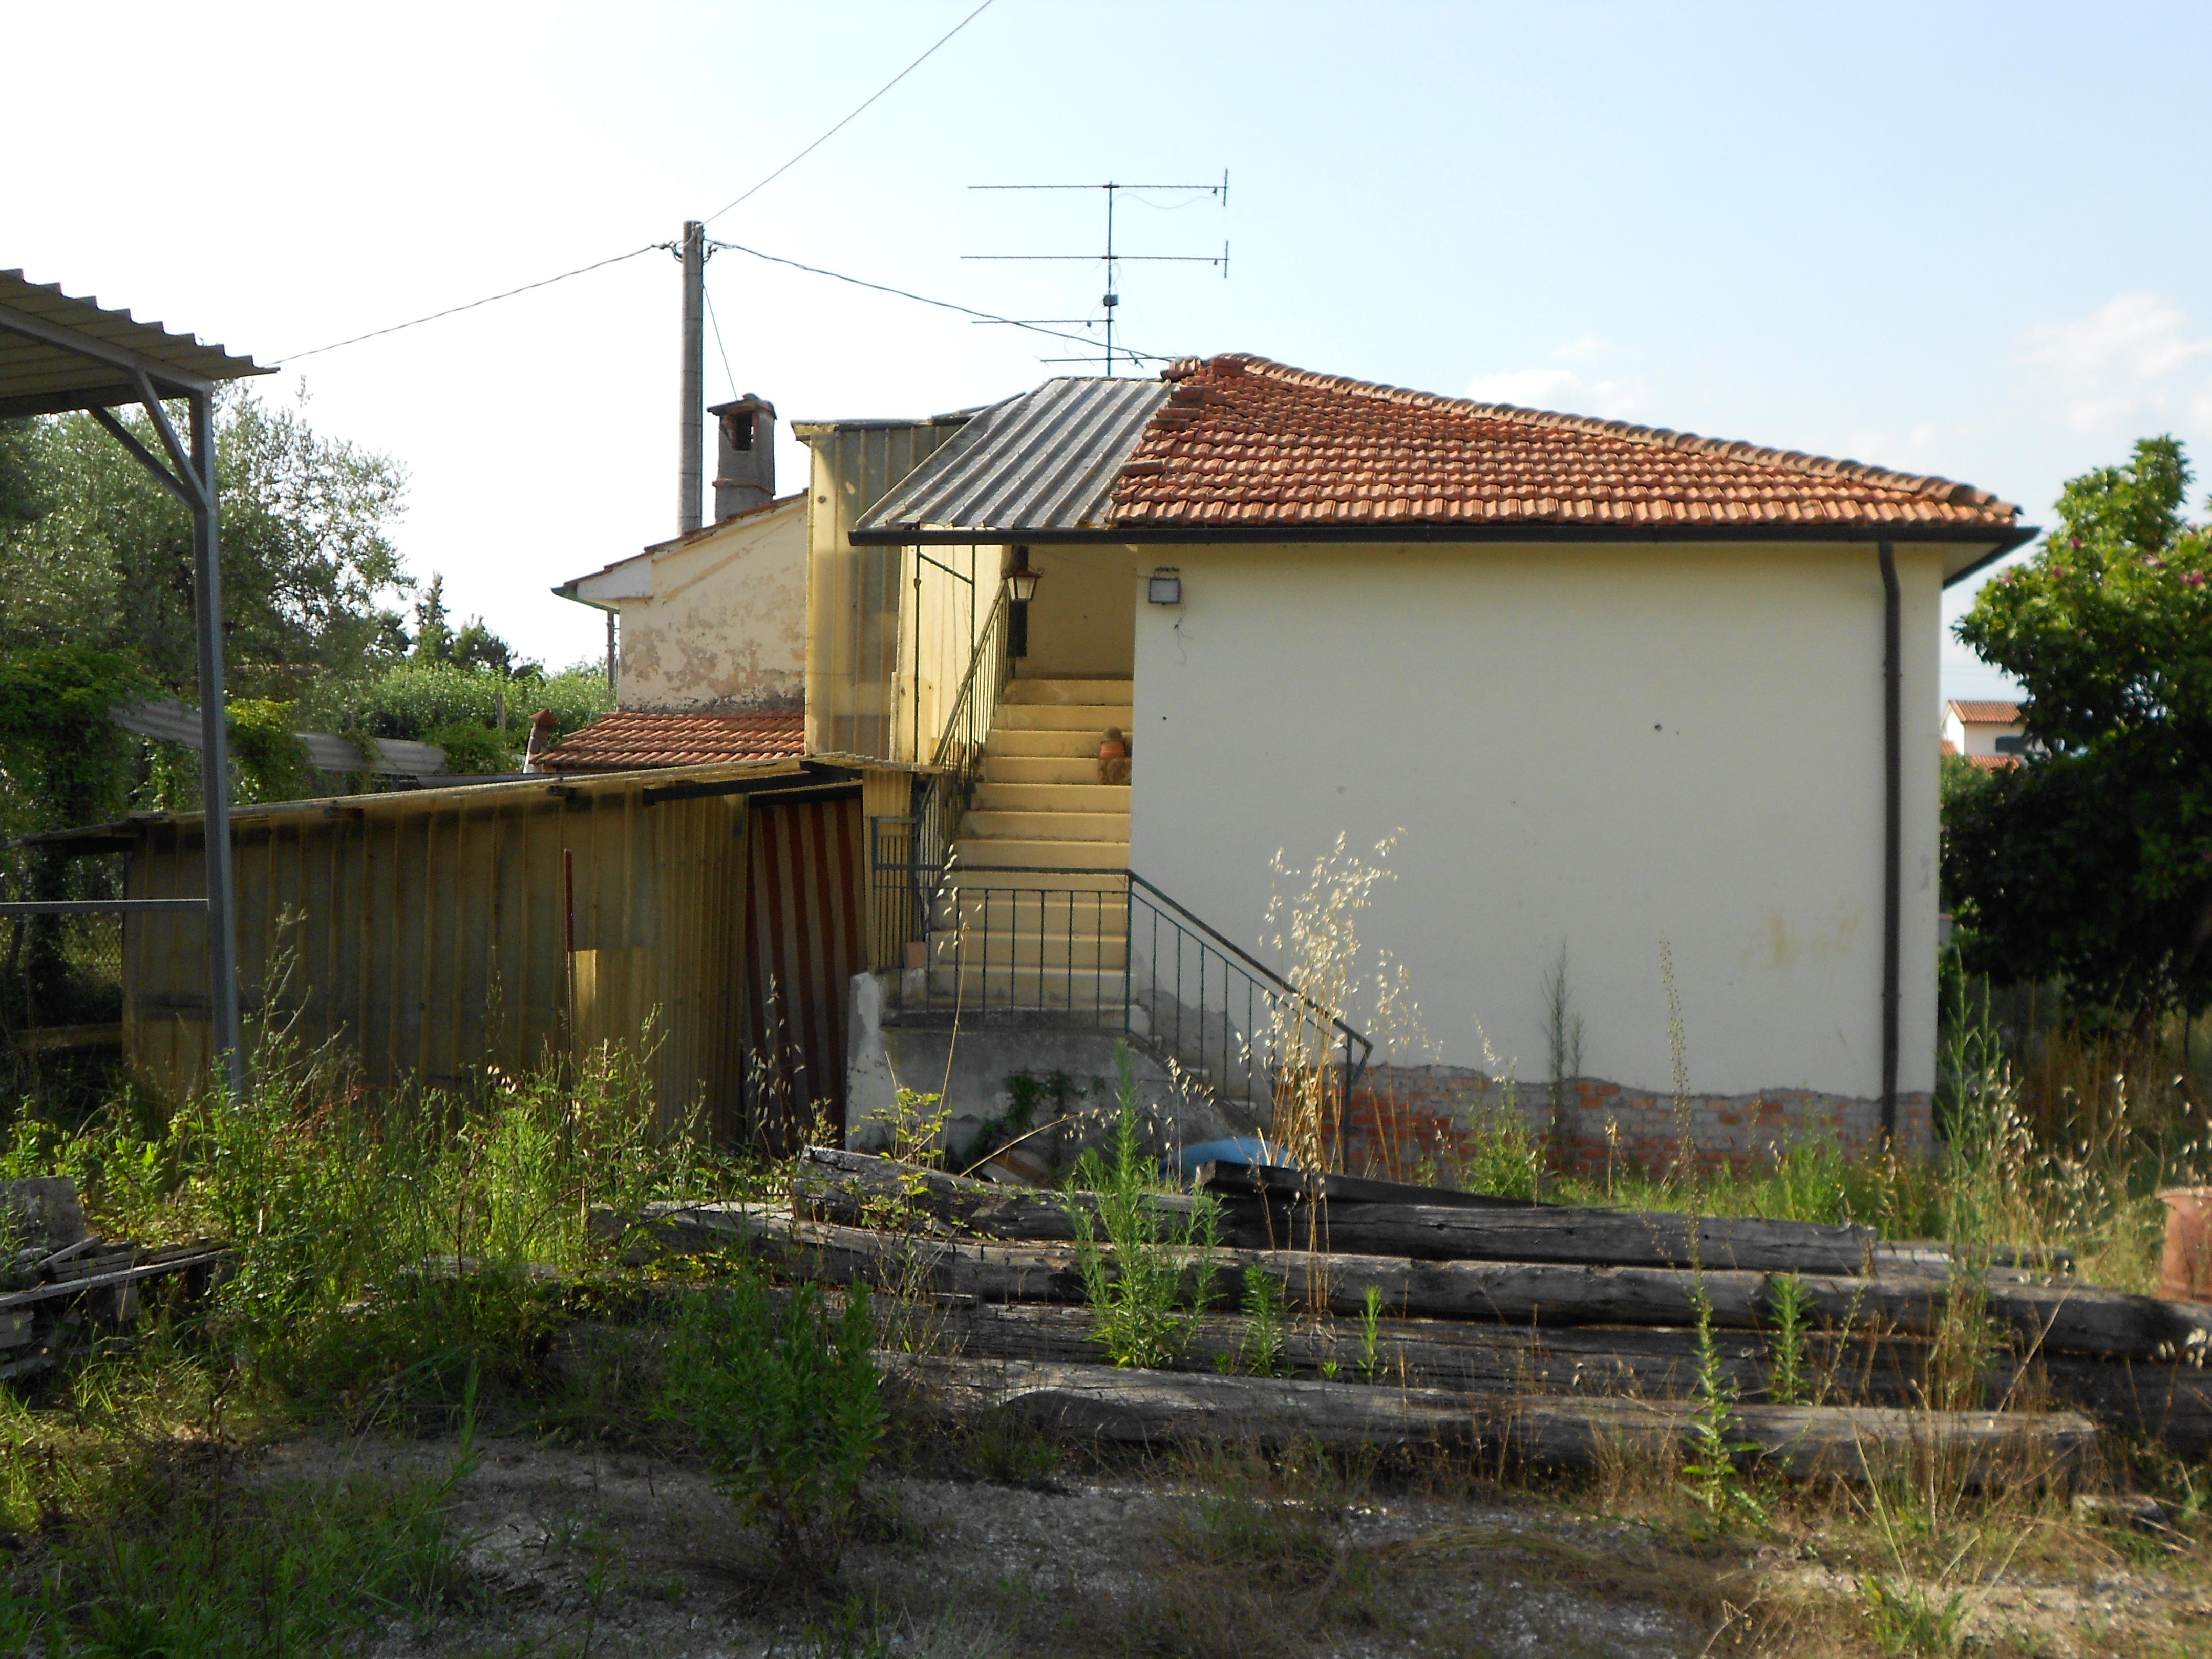 Vendita casa indipendente querce firenze italia via peciatina - Case in vendita firenze giardino ...